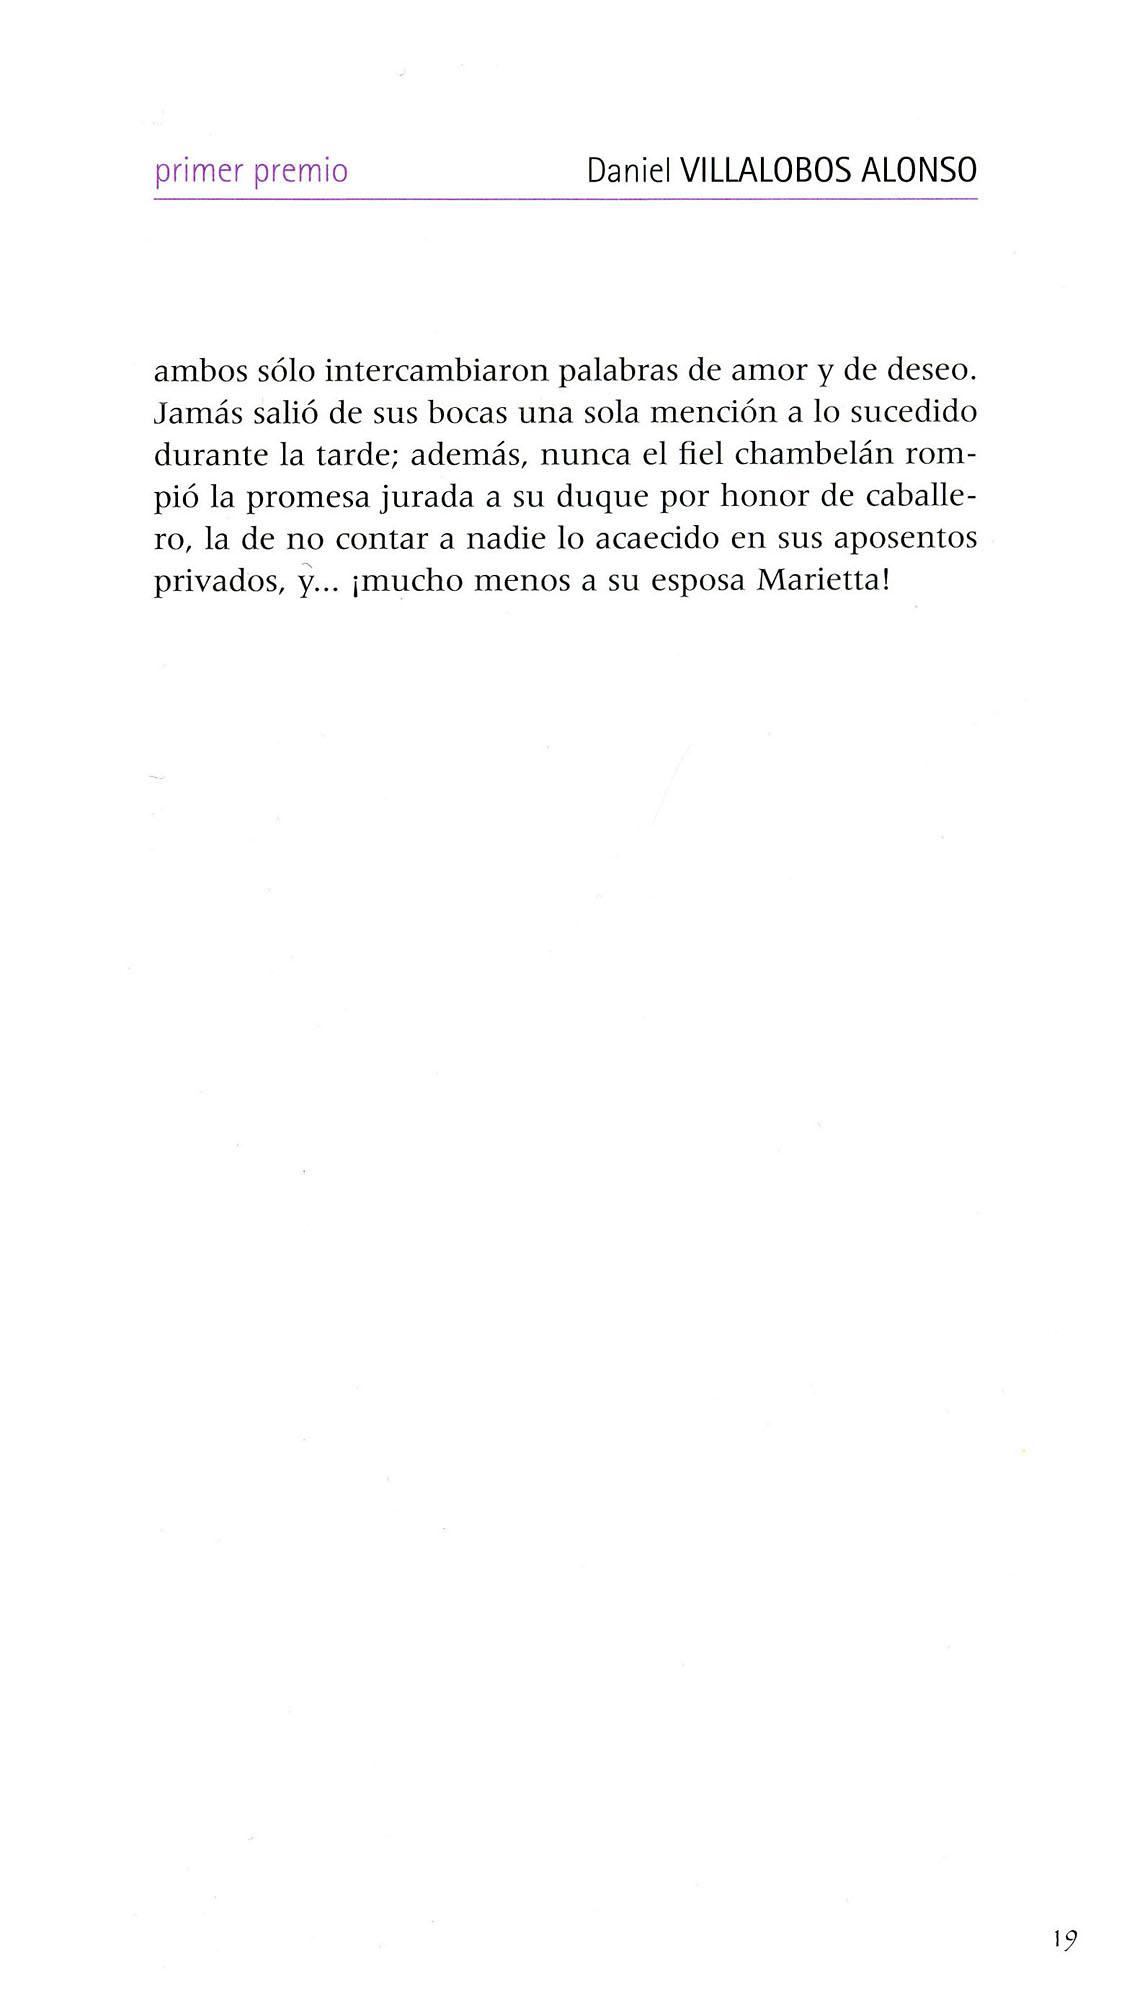 danielvillalobos-calderonsamaniego-story-storyerotic-spanishliterature-13